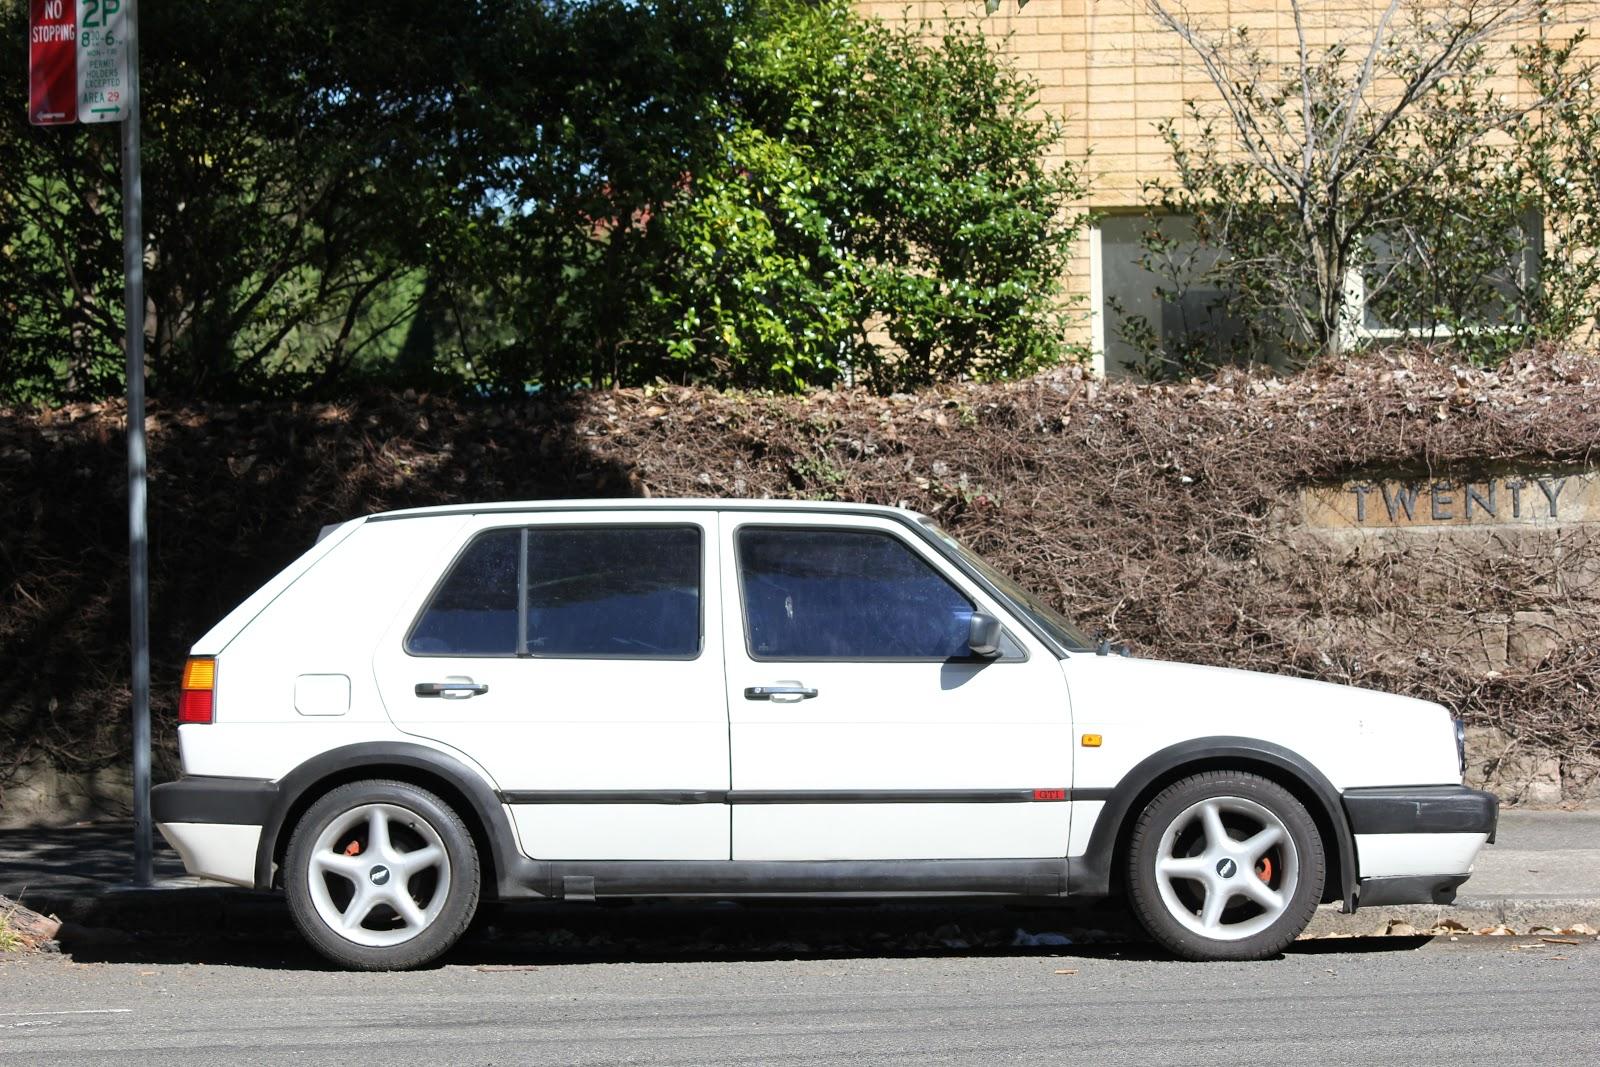 aussie old parked cars 1992 volkswagen golf gti mk2. Black Bedroom Furniture Sets. Home Design Ideas